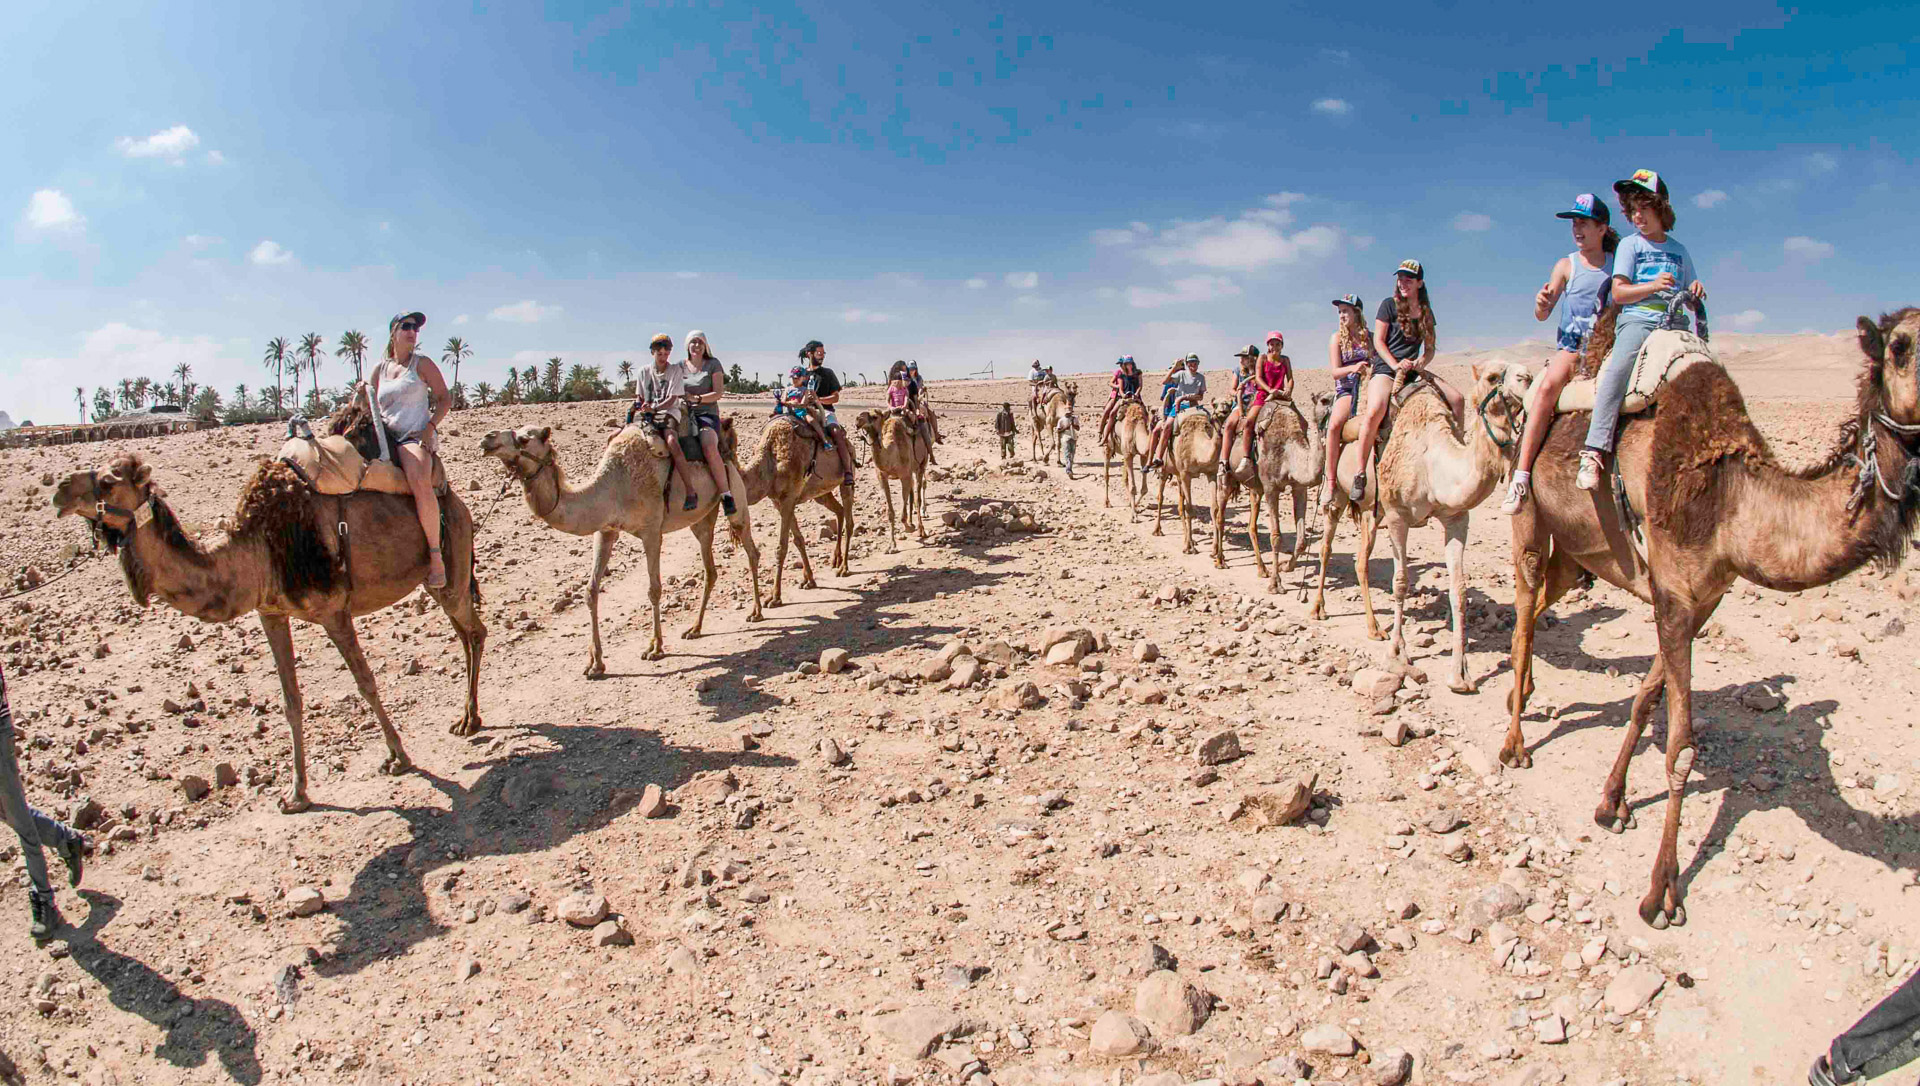 Family Camel rides